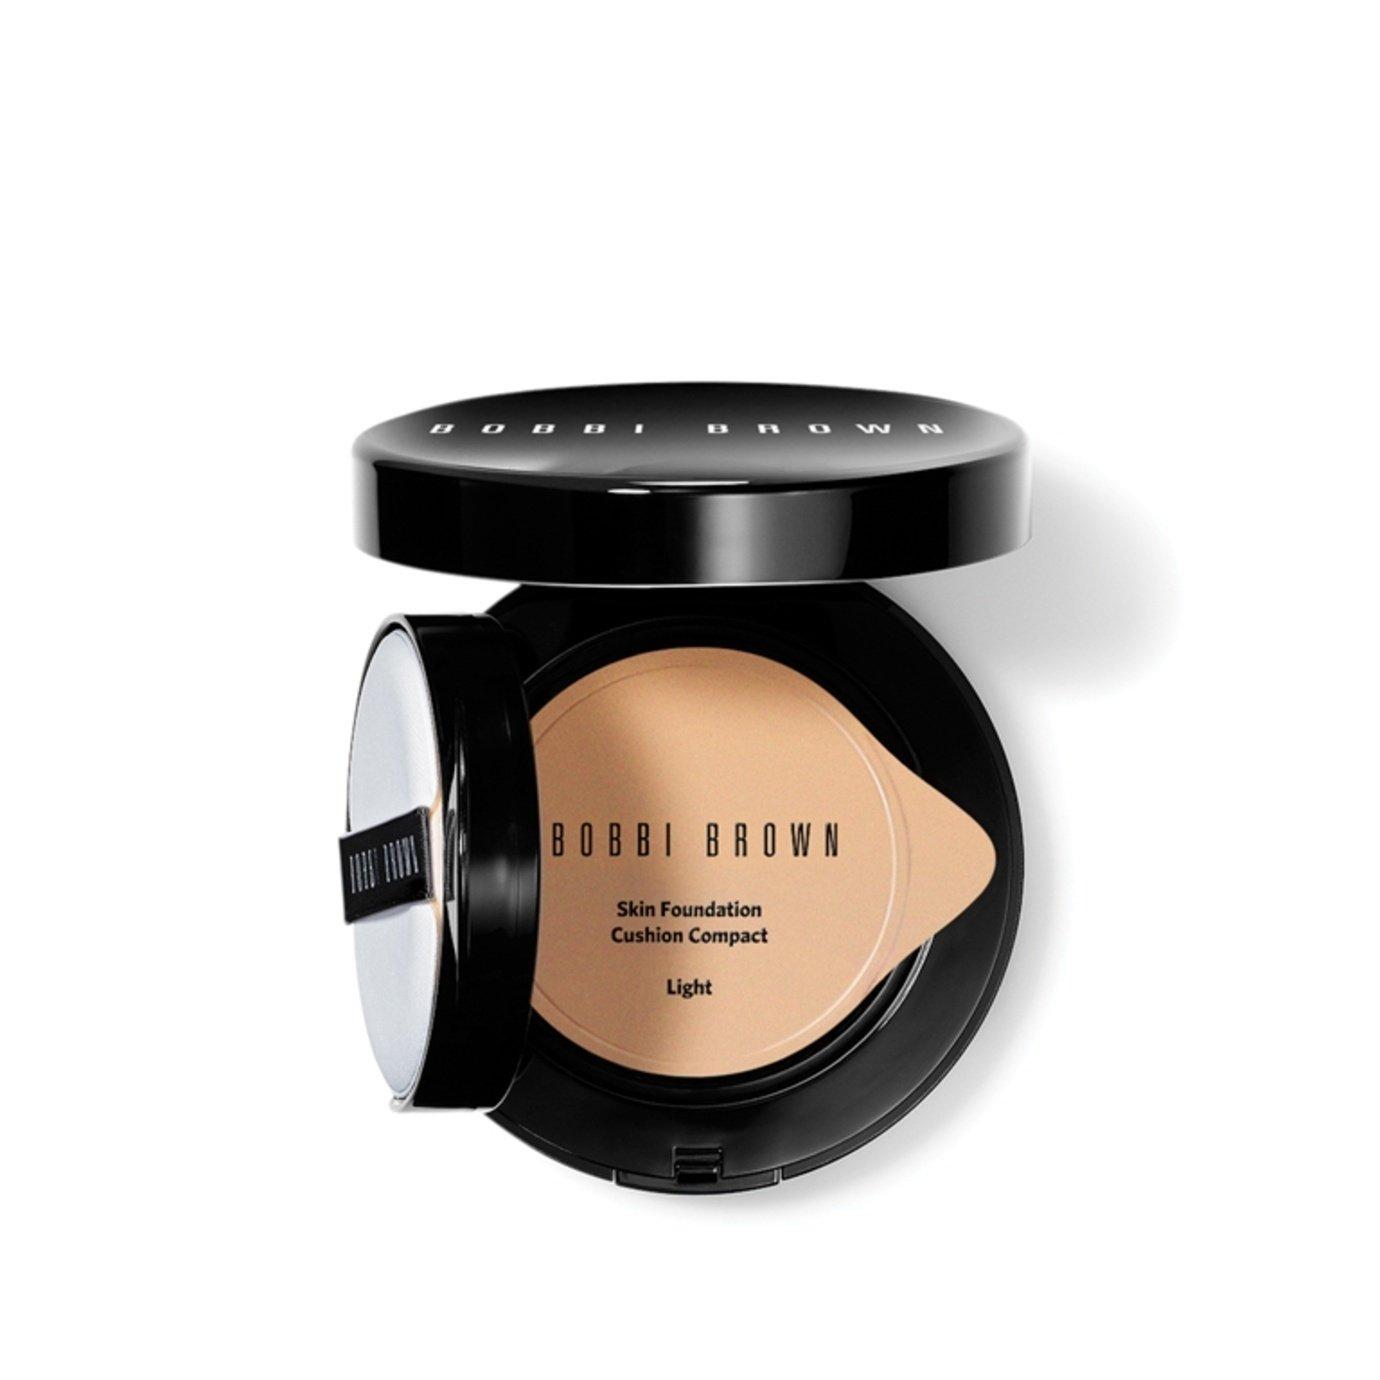 bobbi-brown-skin-foundation-cushion-compact-light